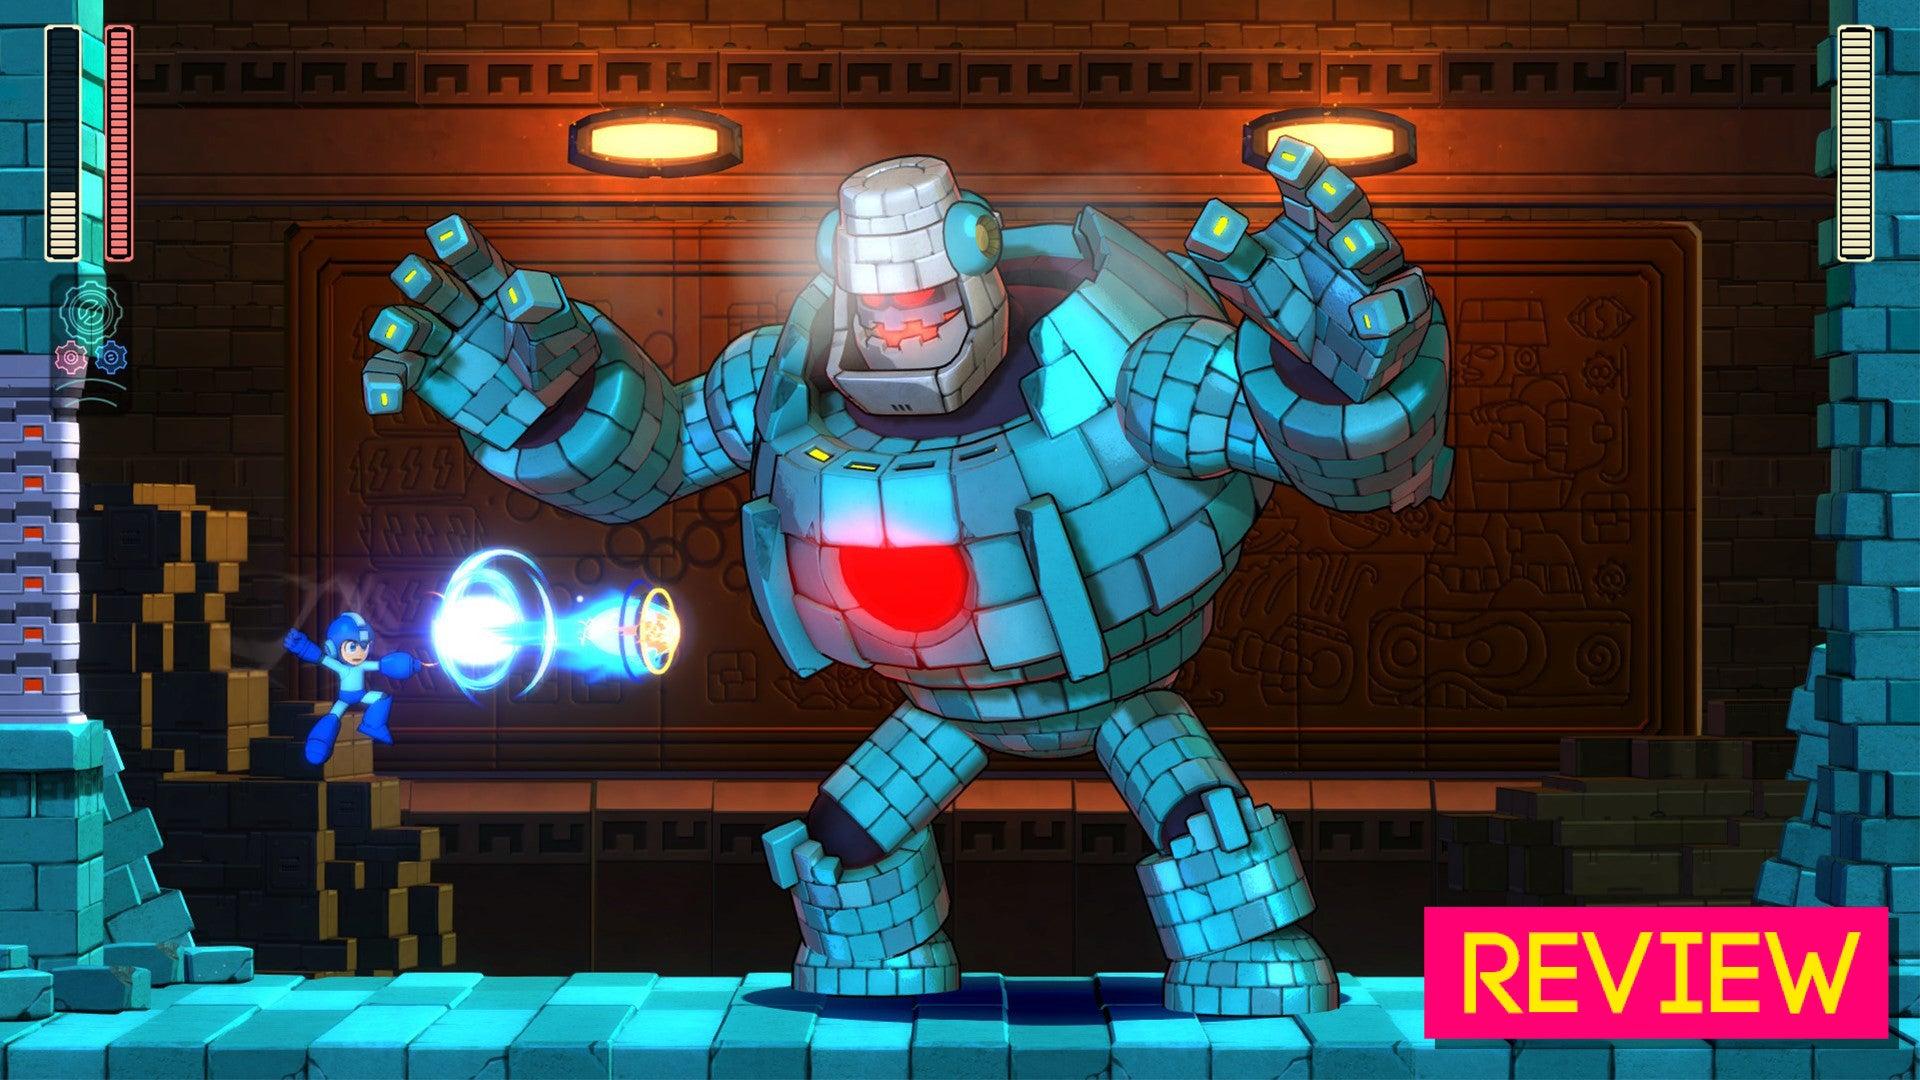 Mega Man 11: The KotakuReview